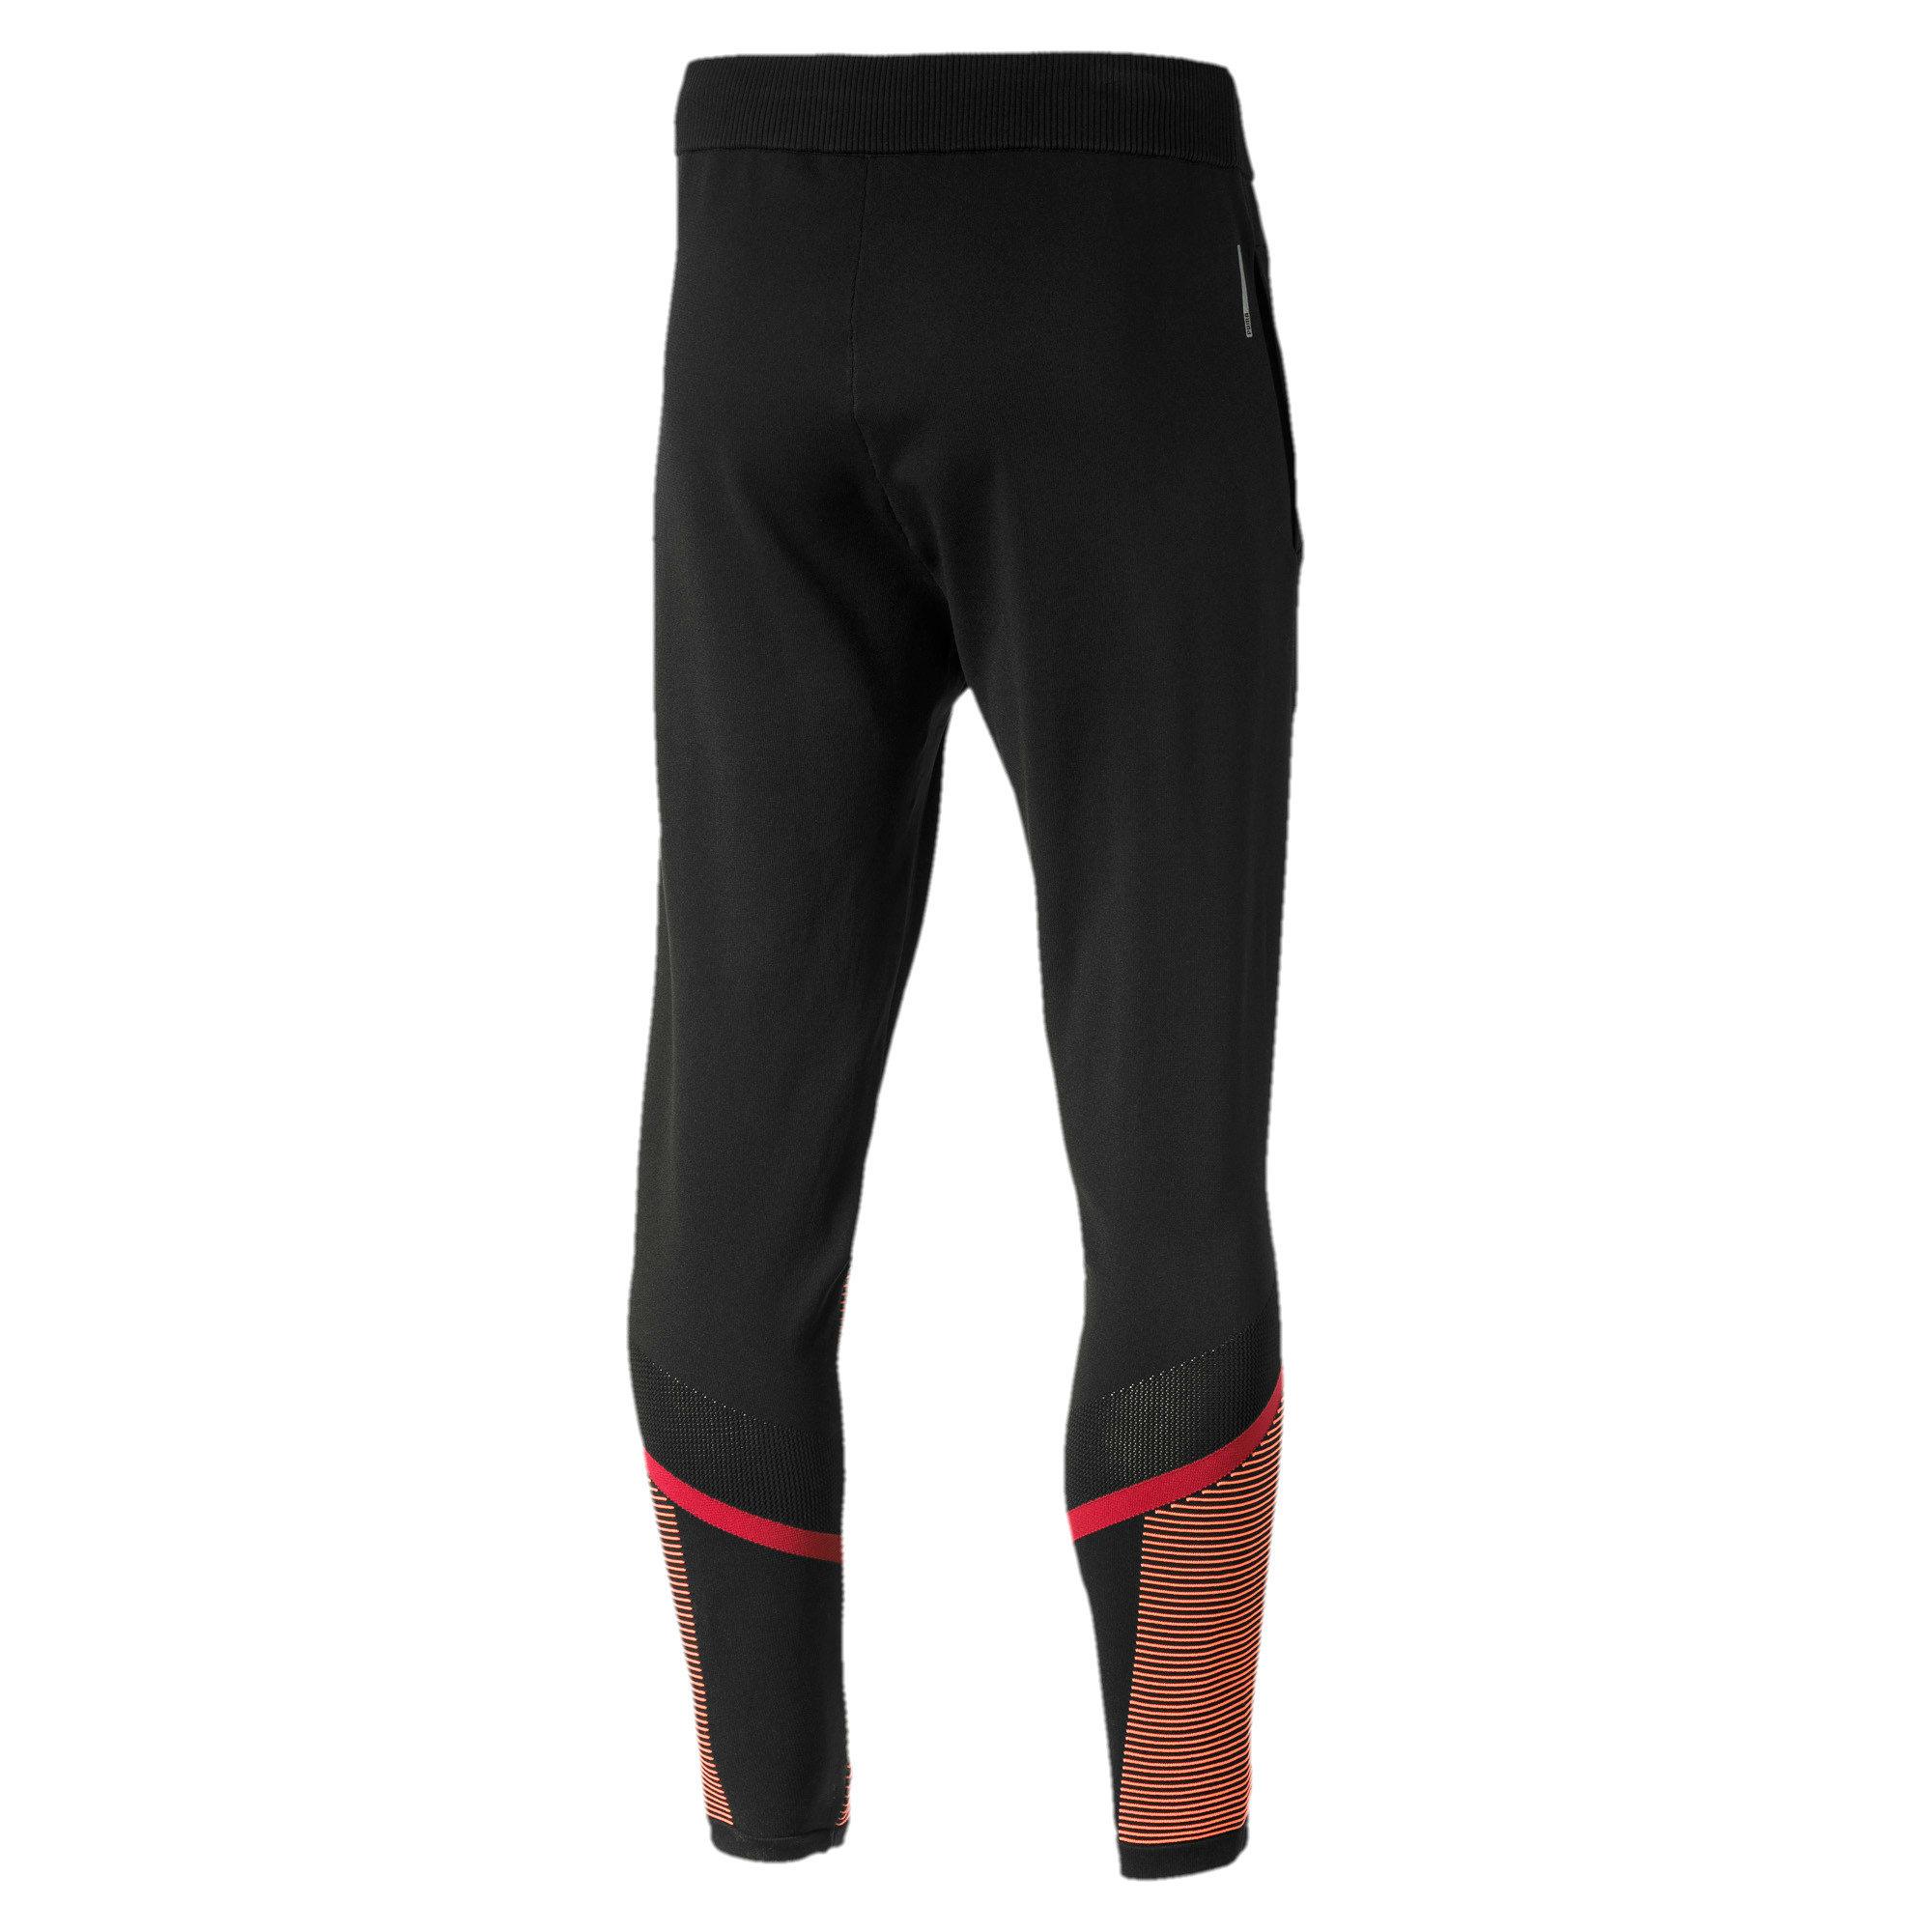 Miniatura 5 de Pantalones Reactive evoKNIT para hombre, Puma Black-Rhubarb, mediano